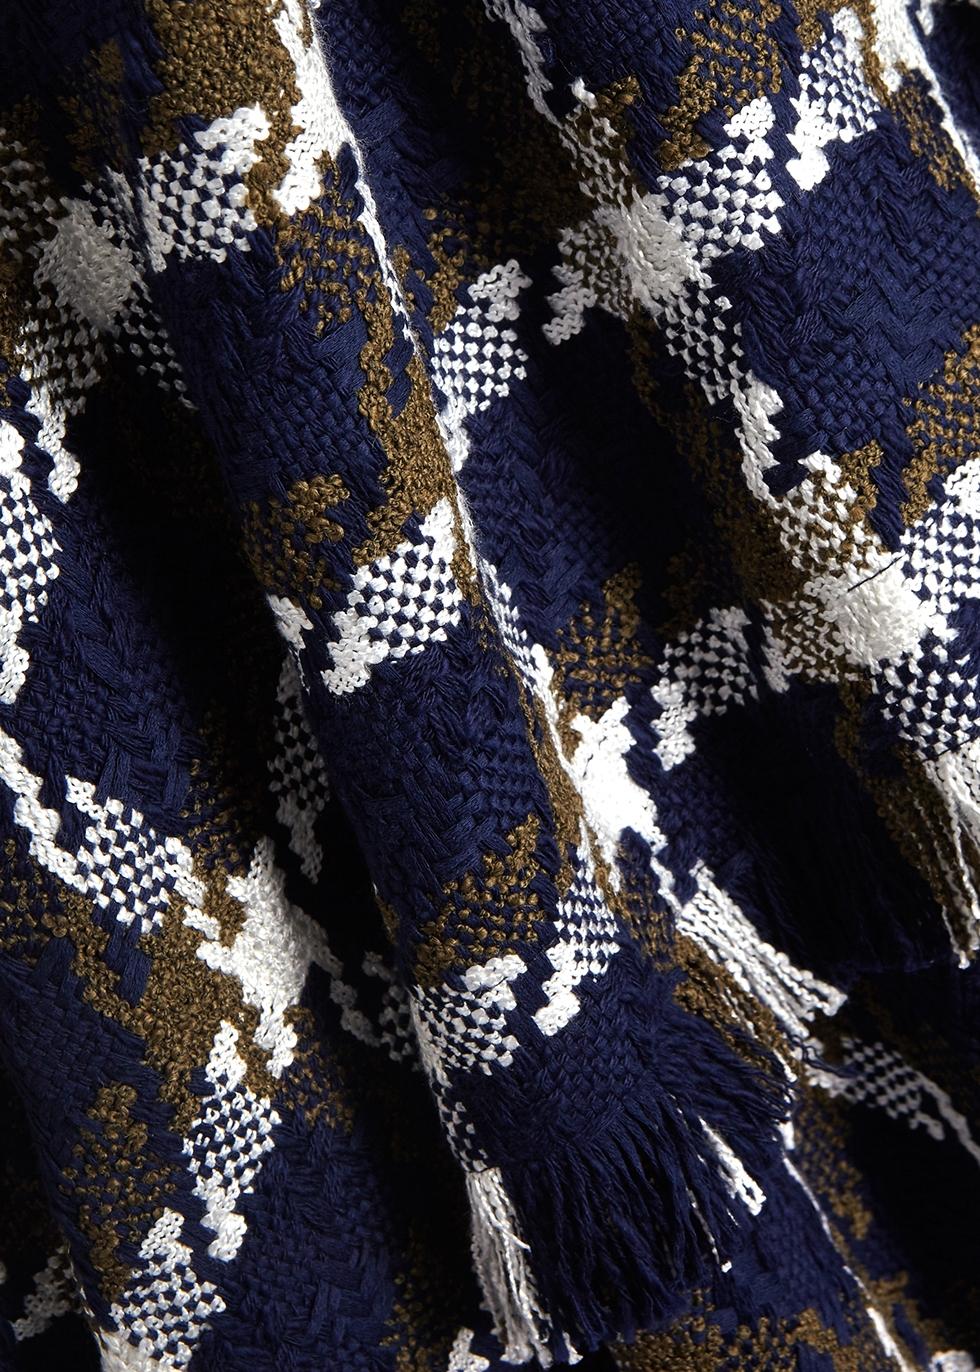 Checked asymmetric tweed dress - MONSE